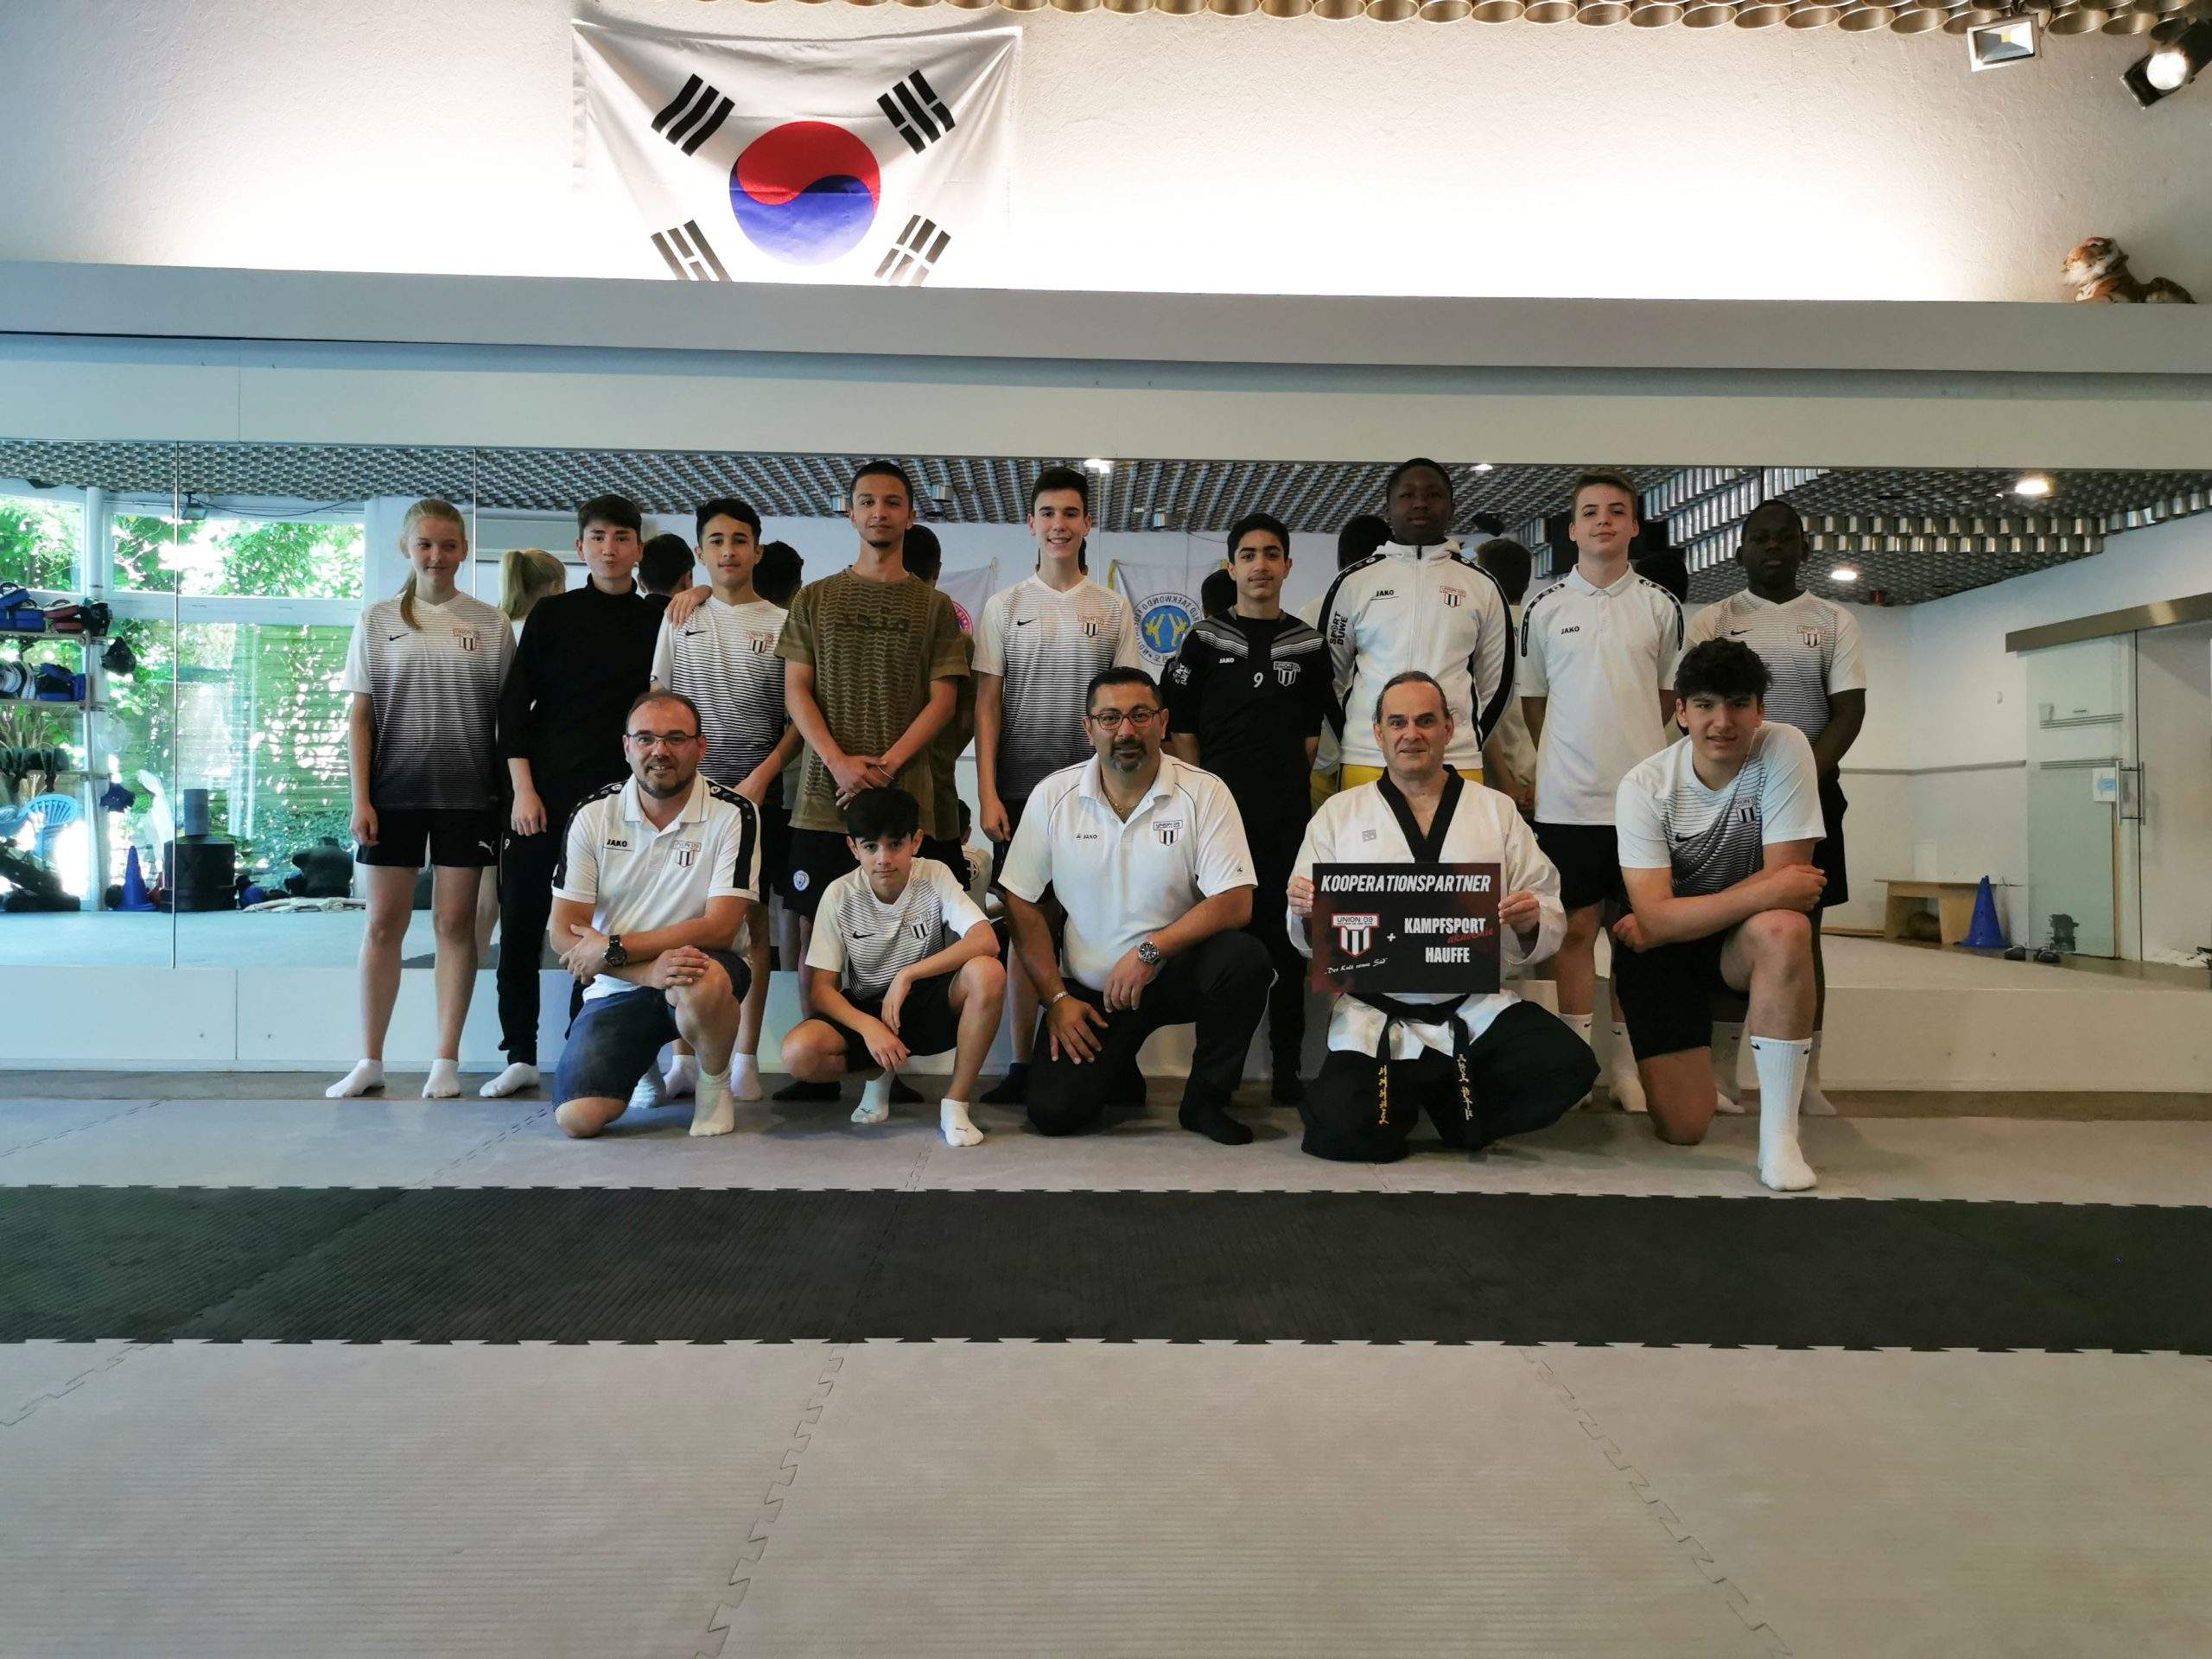 Neuer Kooperationspartner – Kampfsportakademie Hauffe